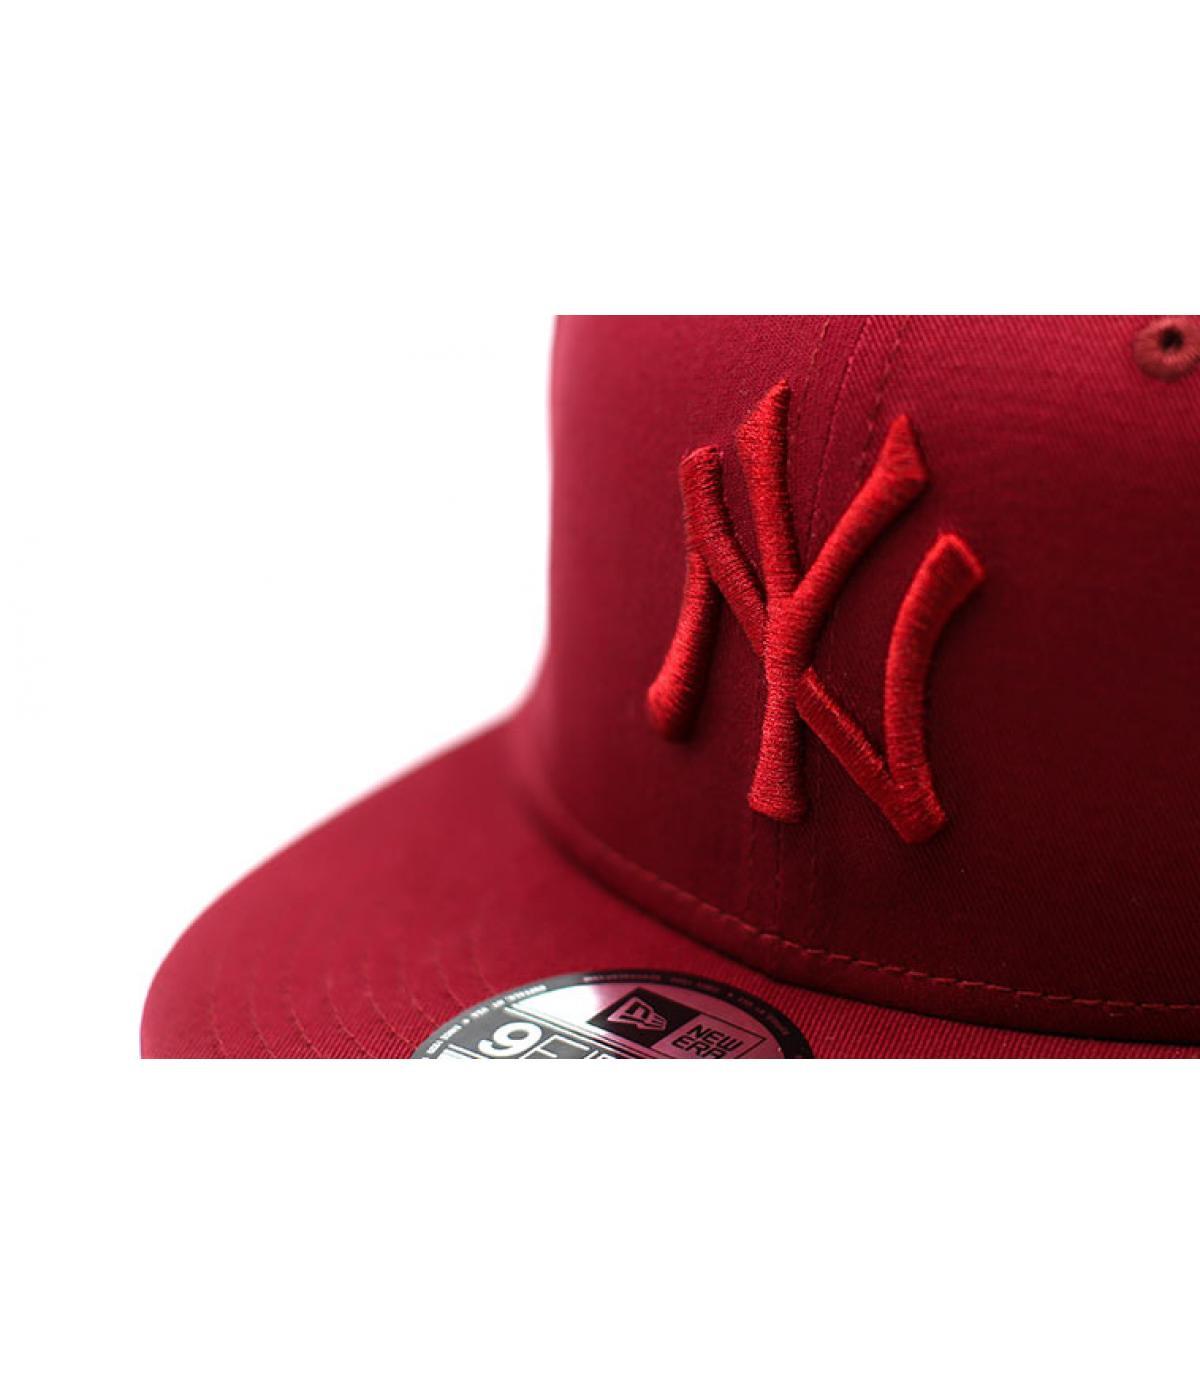 Details Snapback League Ess 9Fifty NY cardinal - Abbildung 3